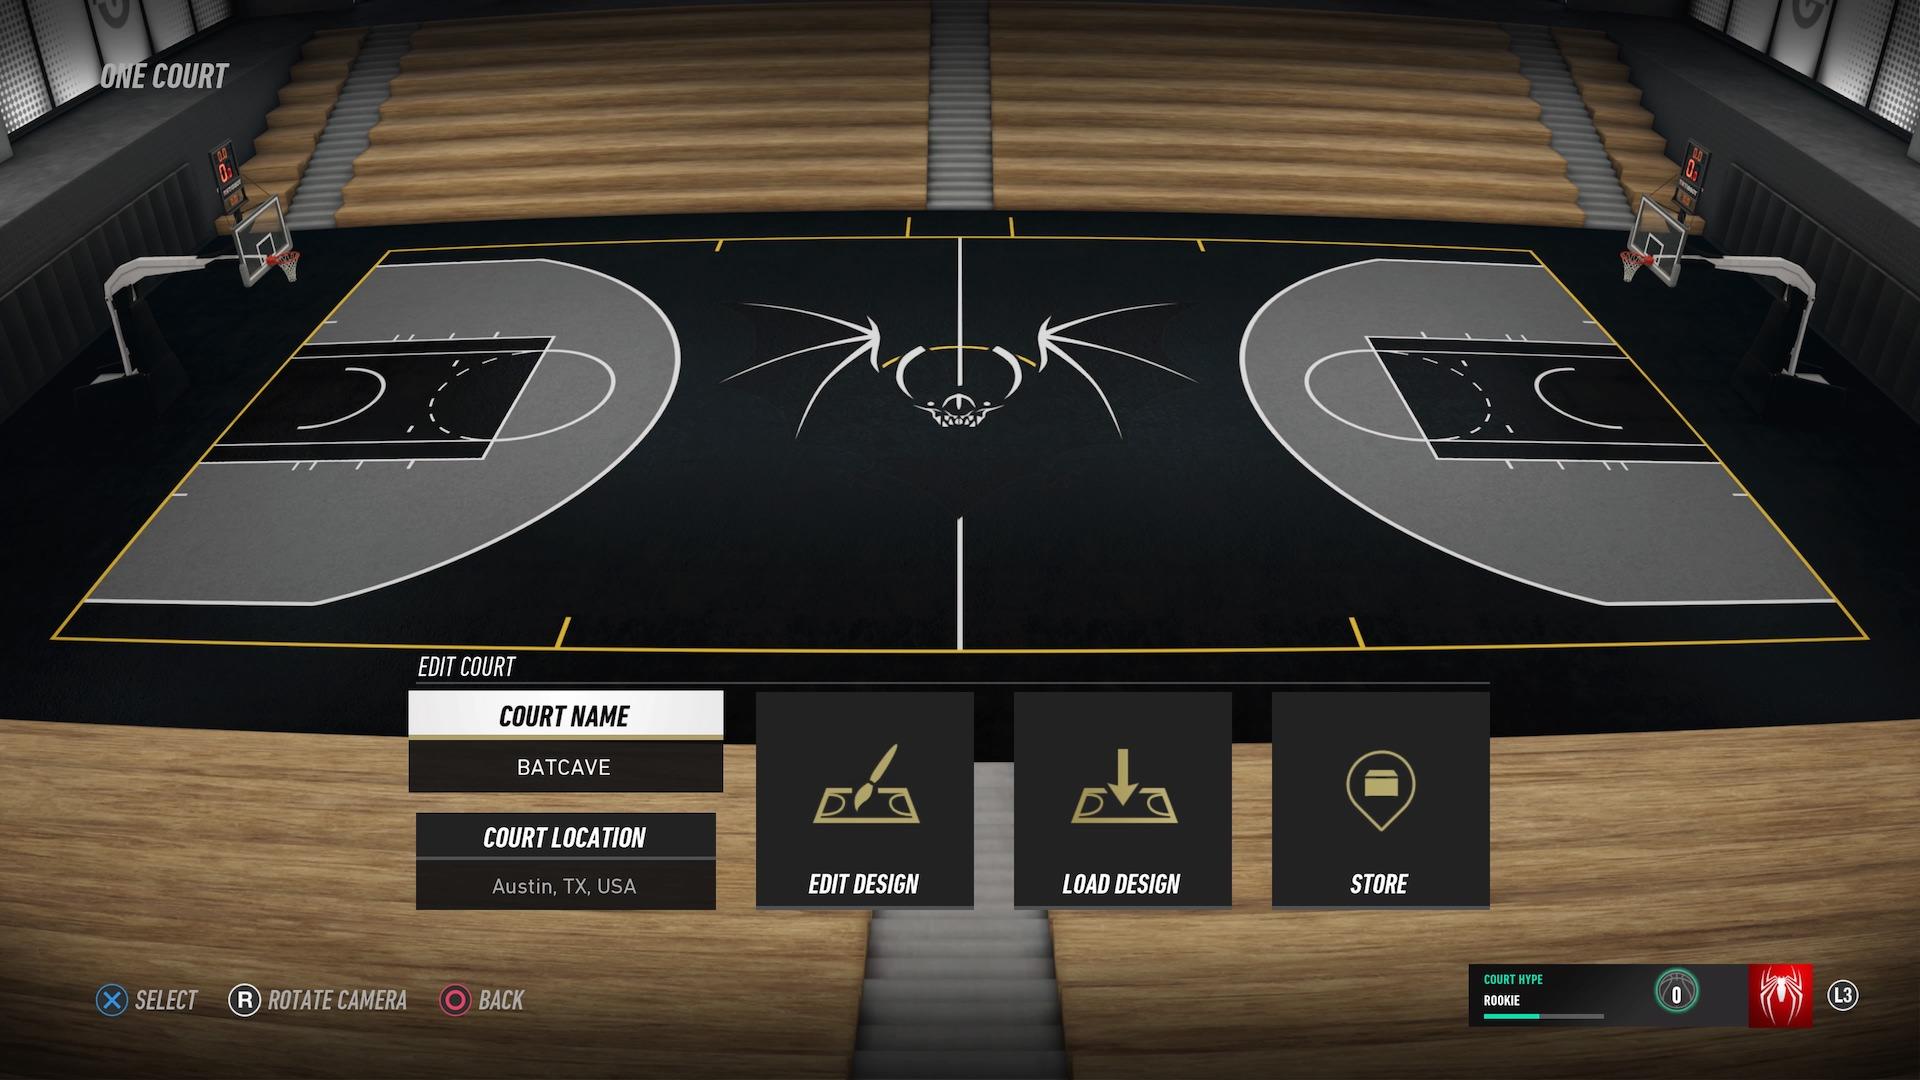 nba_live_19_create_court